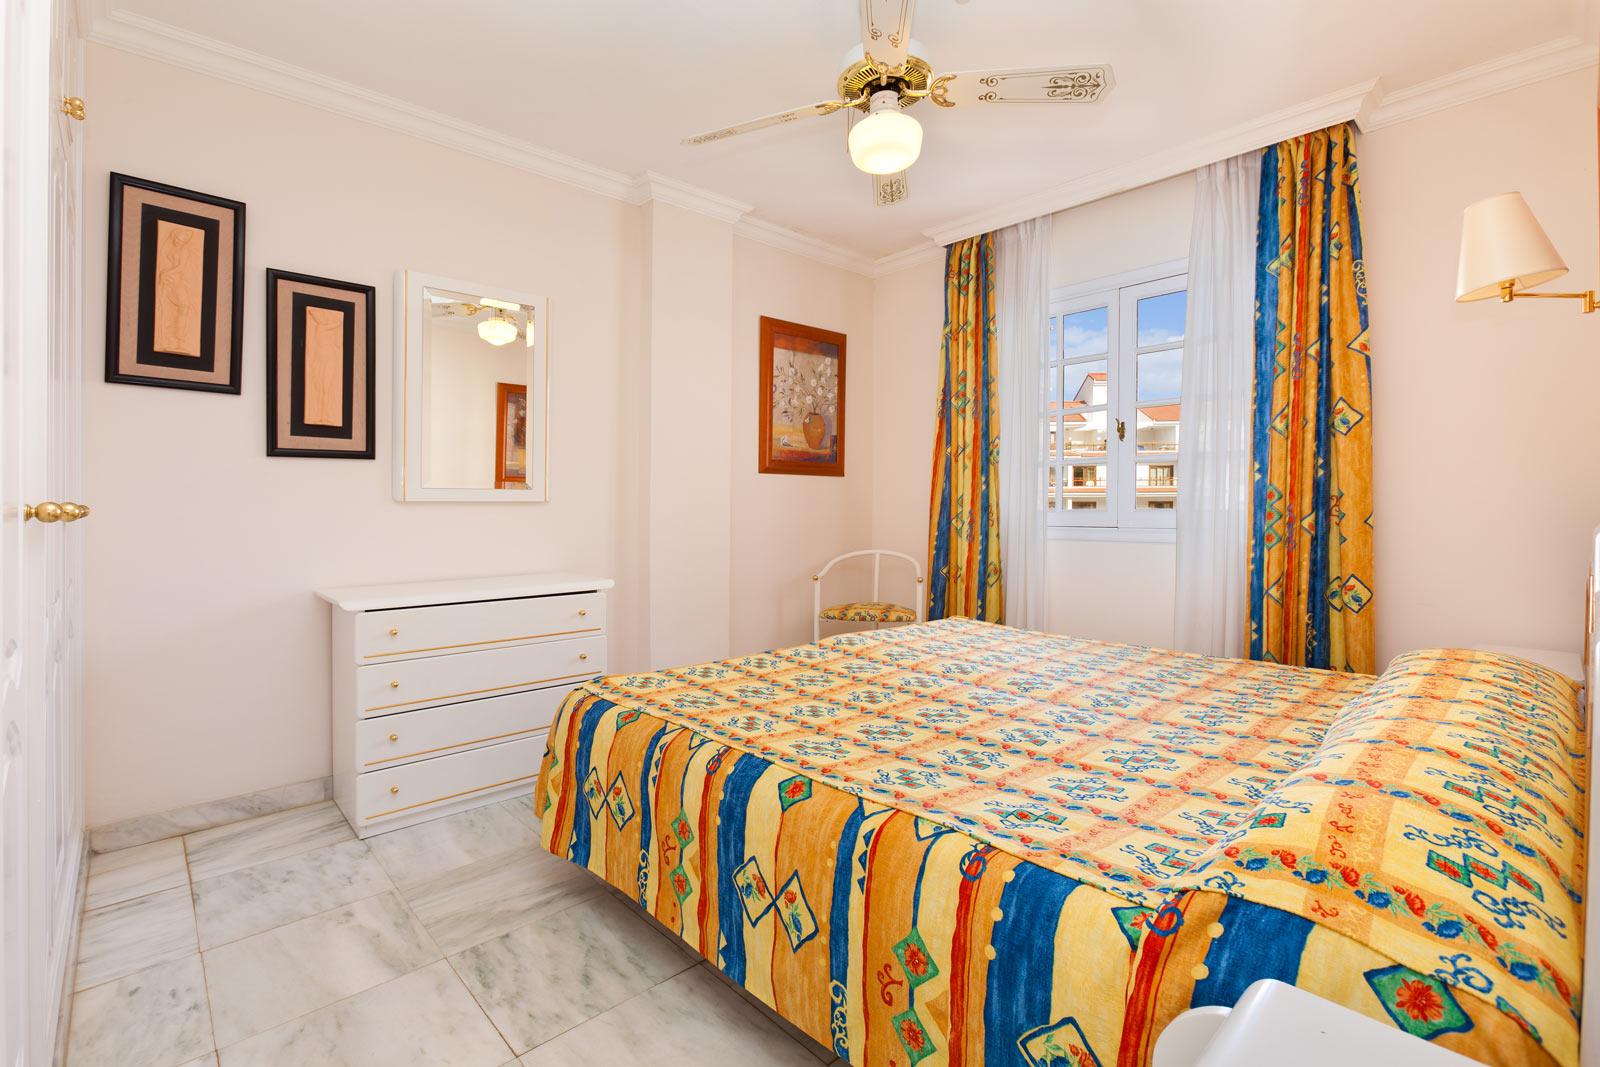 Apartamentos 2 dormitorios apartamentos casablanca tenerife for Camas tenerife